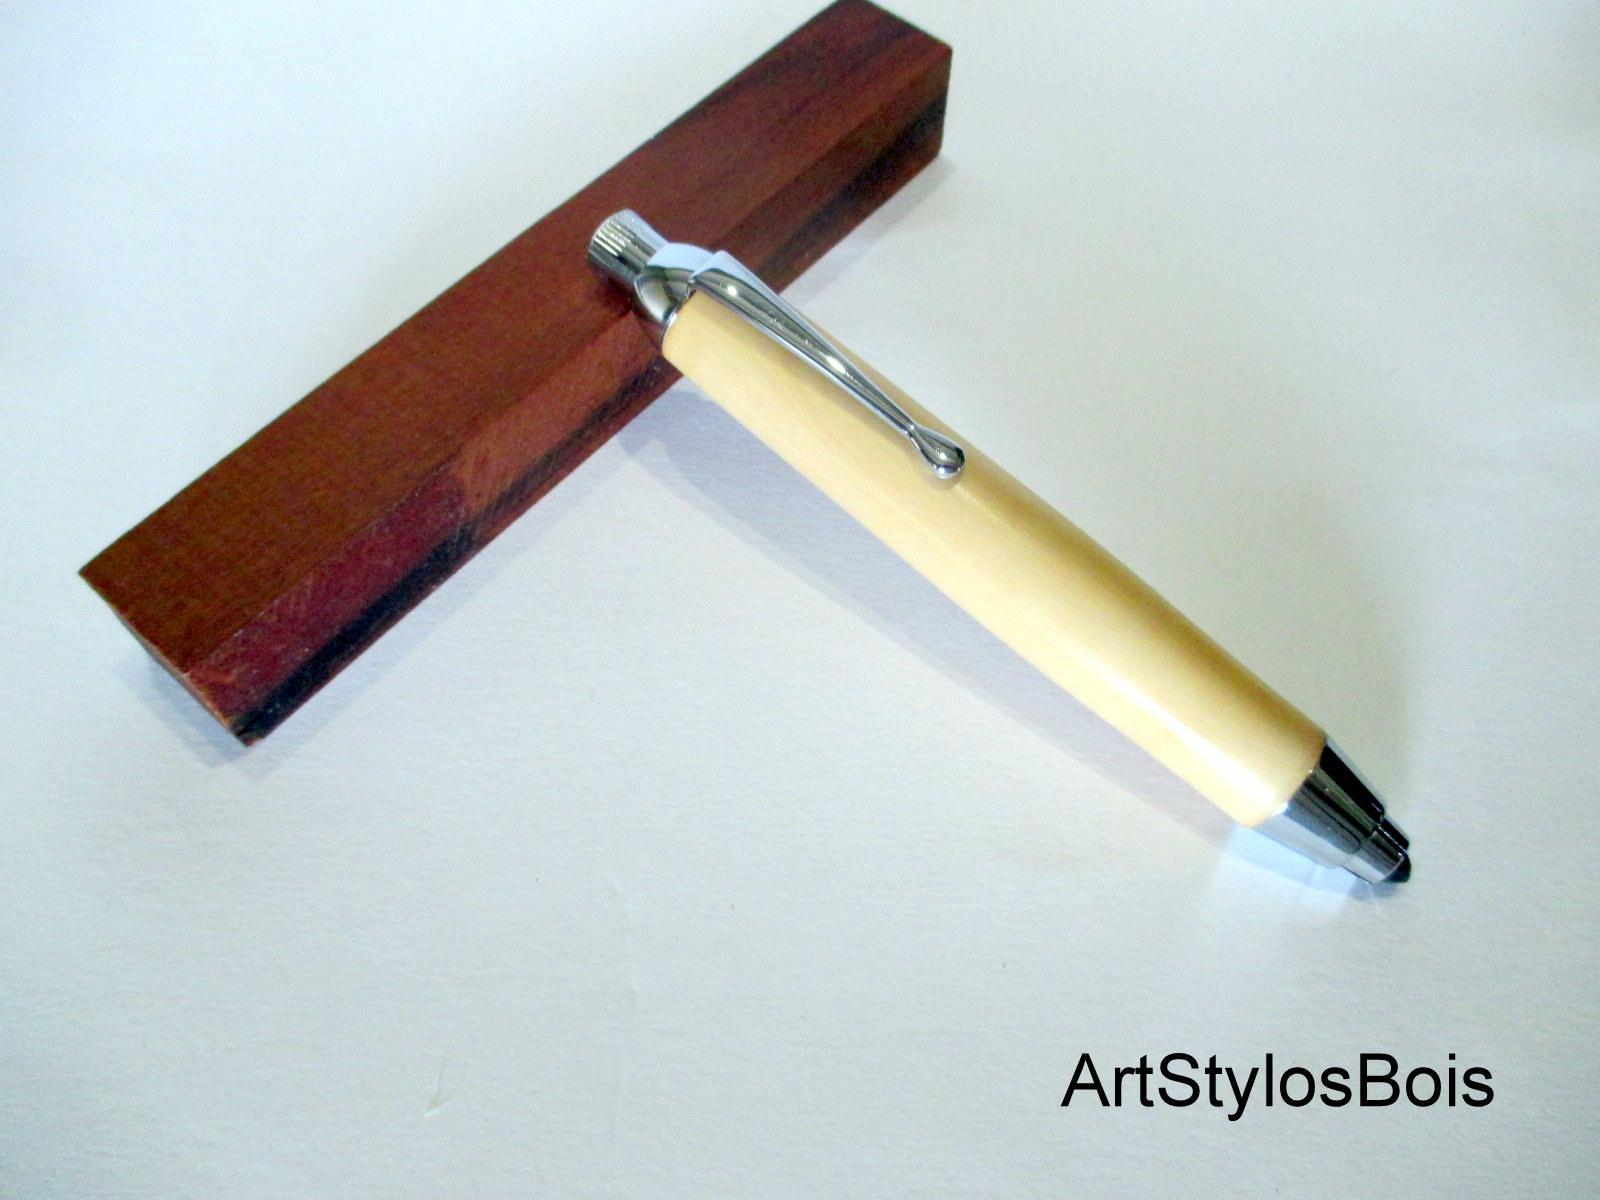 Stylo a crayon en bois de Buis